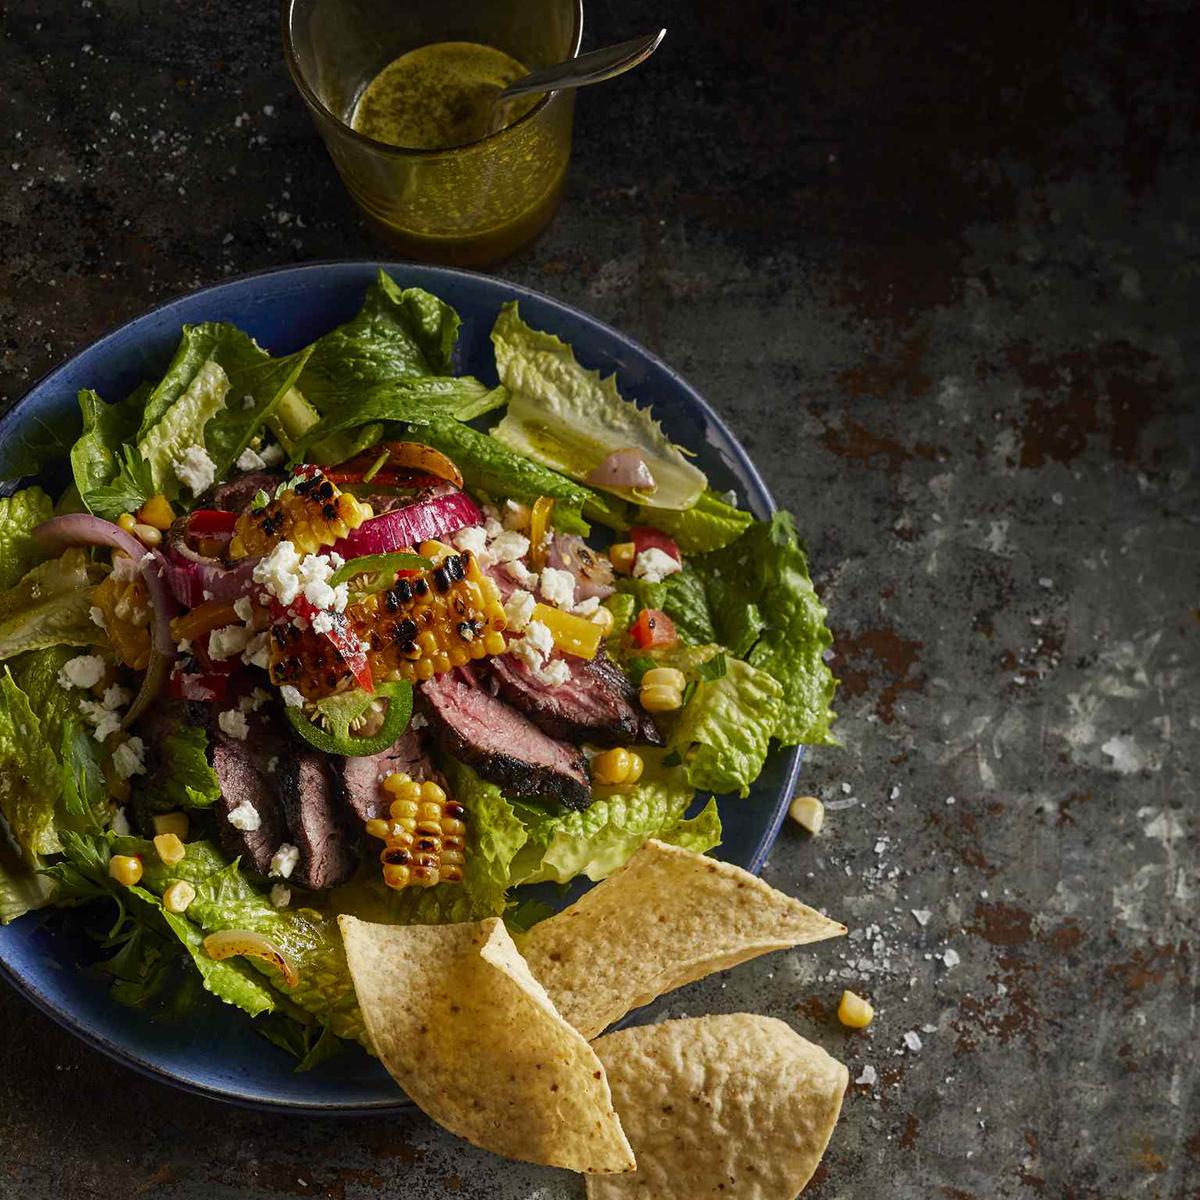 Cilantro-Lime Steak Salad